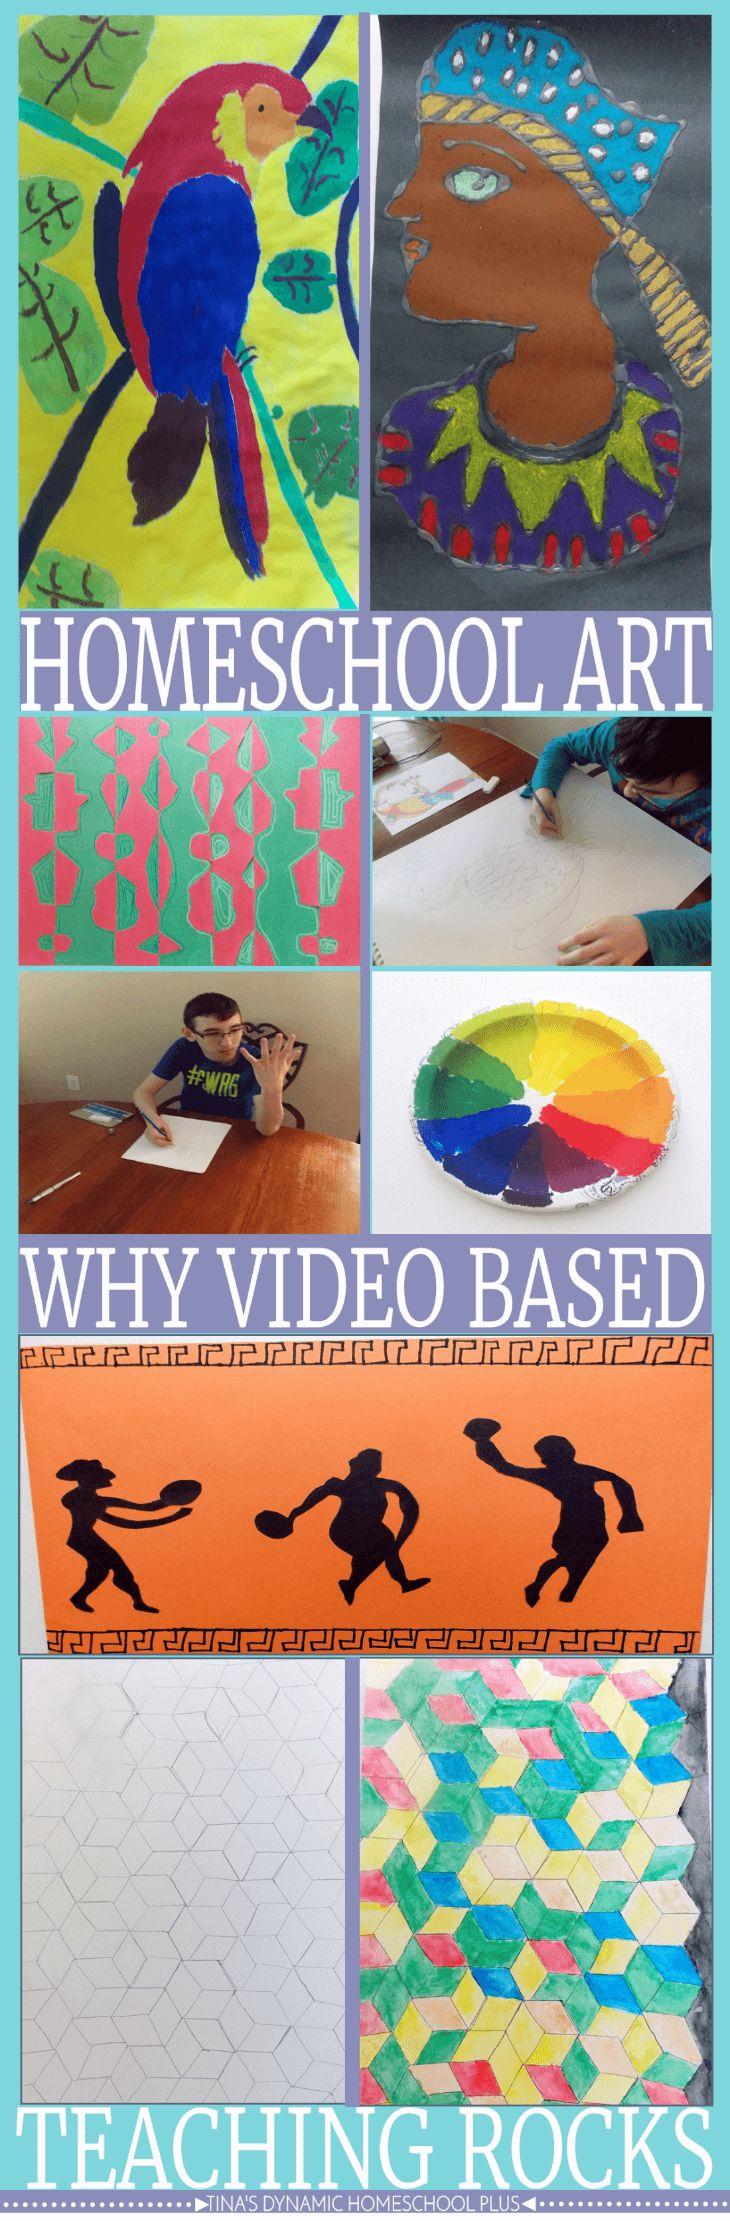 Homeschool Art (Why Video Based Teaching Rocks) @ Tina's Dynamic Homeschool Plus